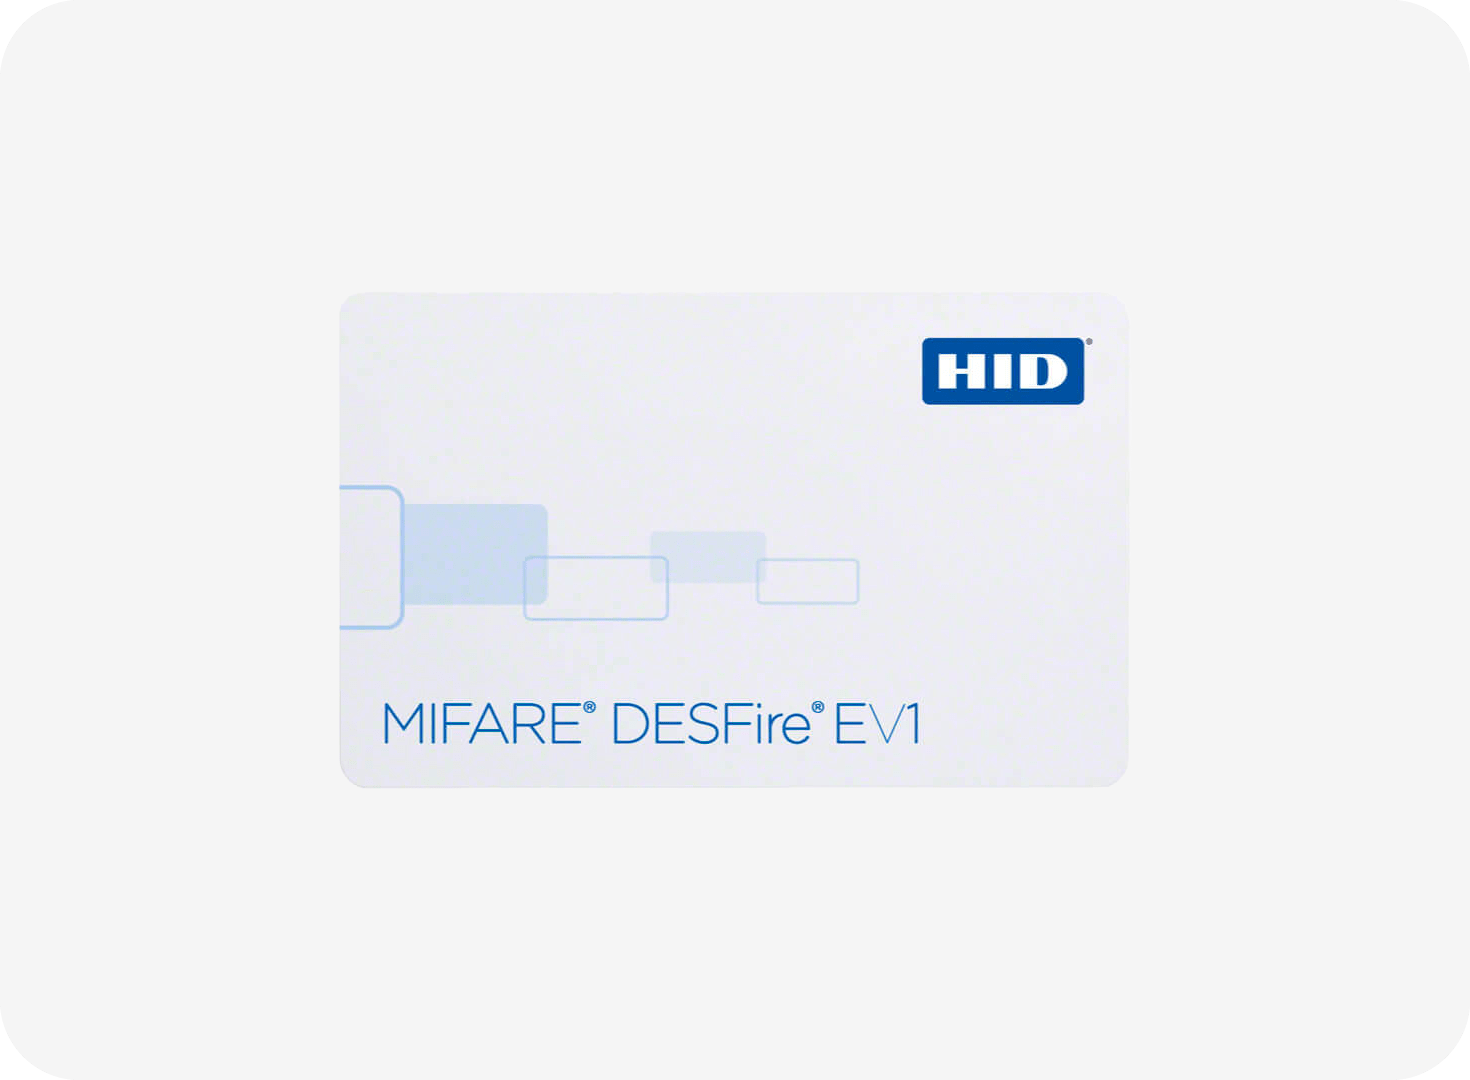 HID FlexSmart/MIFARE DESFire EV1 1450 Card